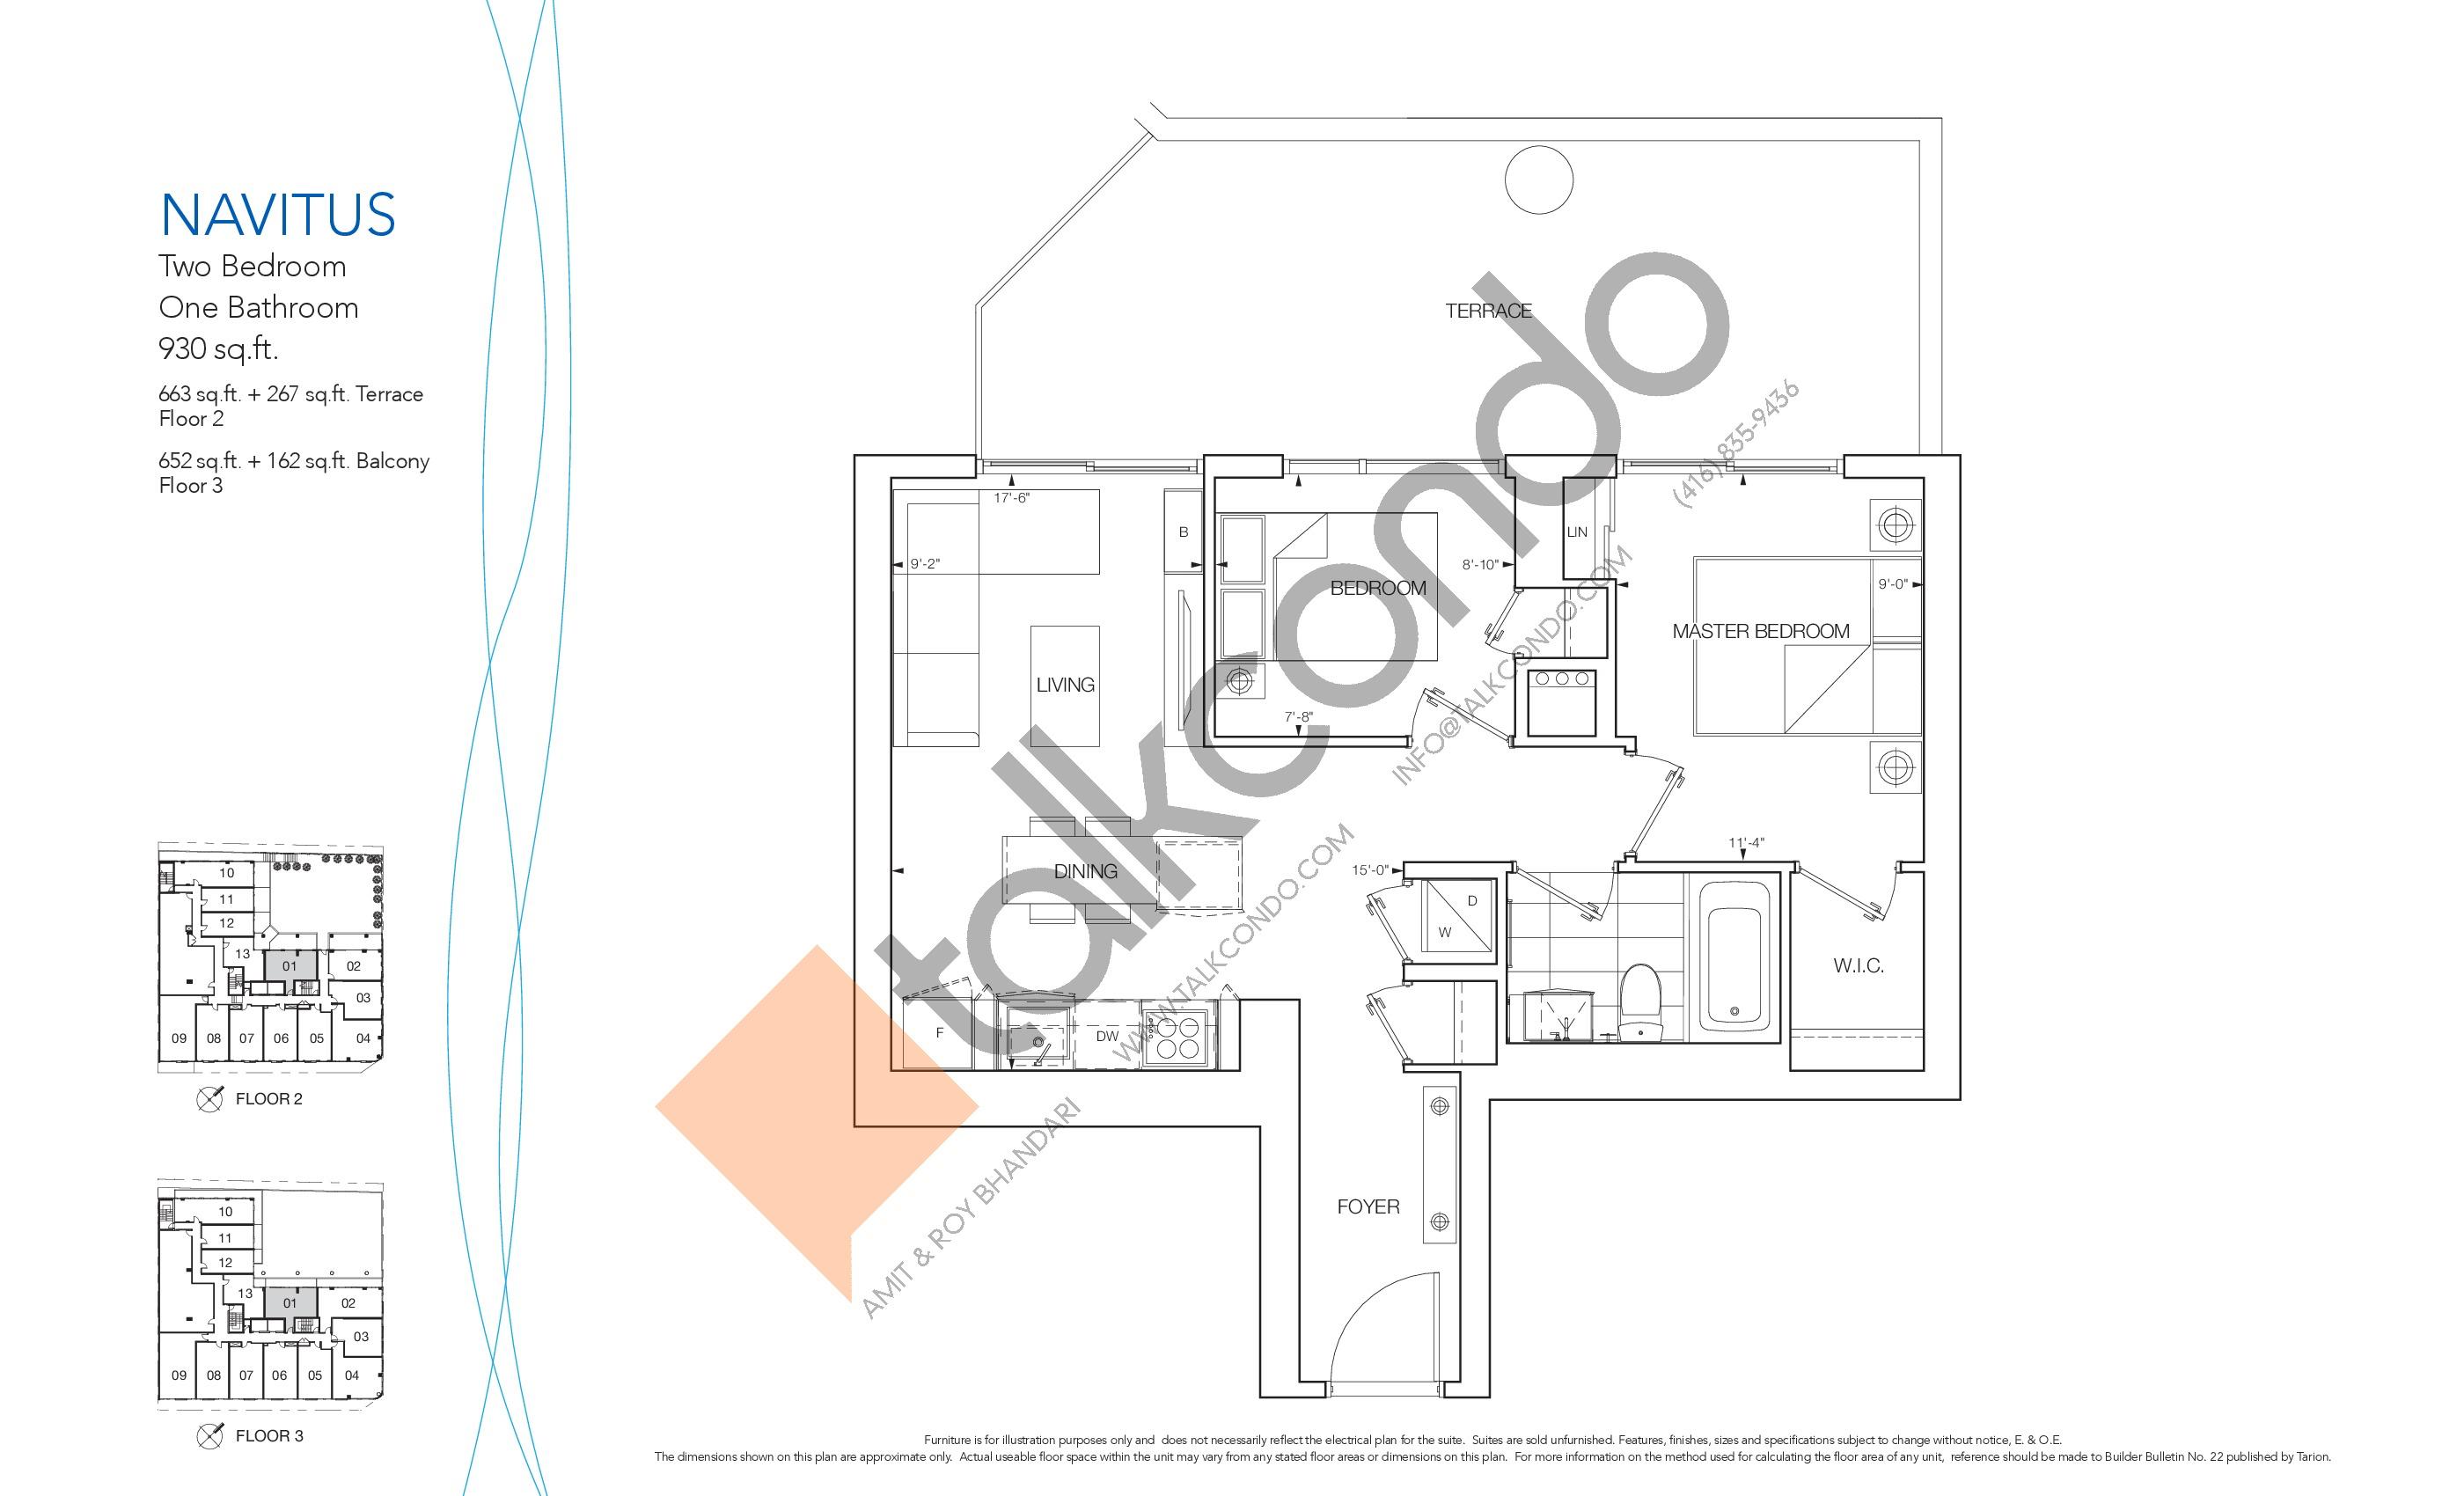 Navitus Floor Plan at Nautique Lakefront Residences - 663 sq.ft